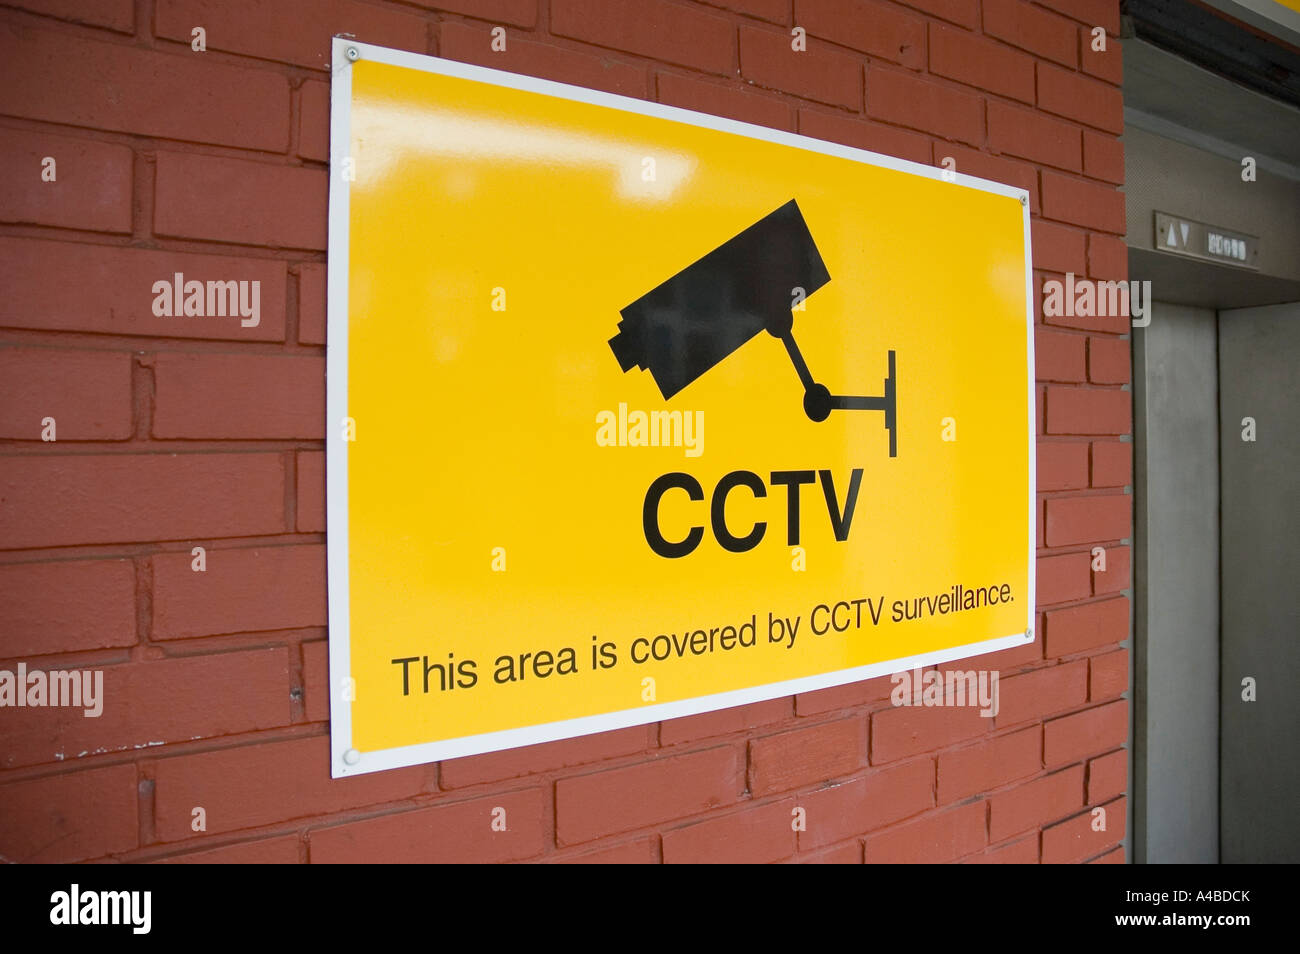 CCTV sign, London - Stock Image